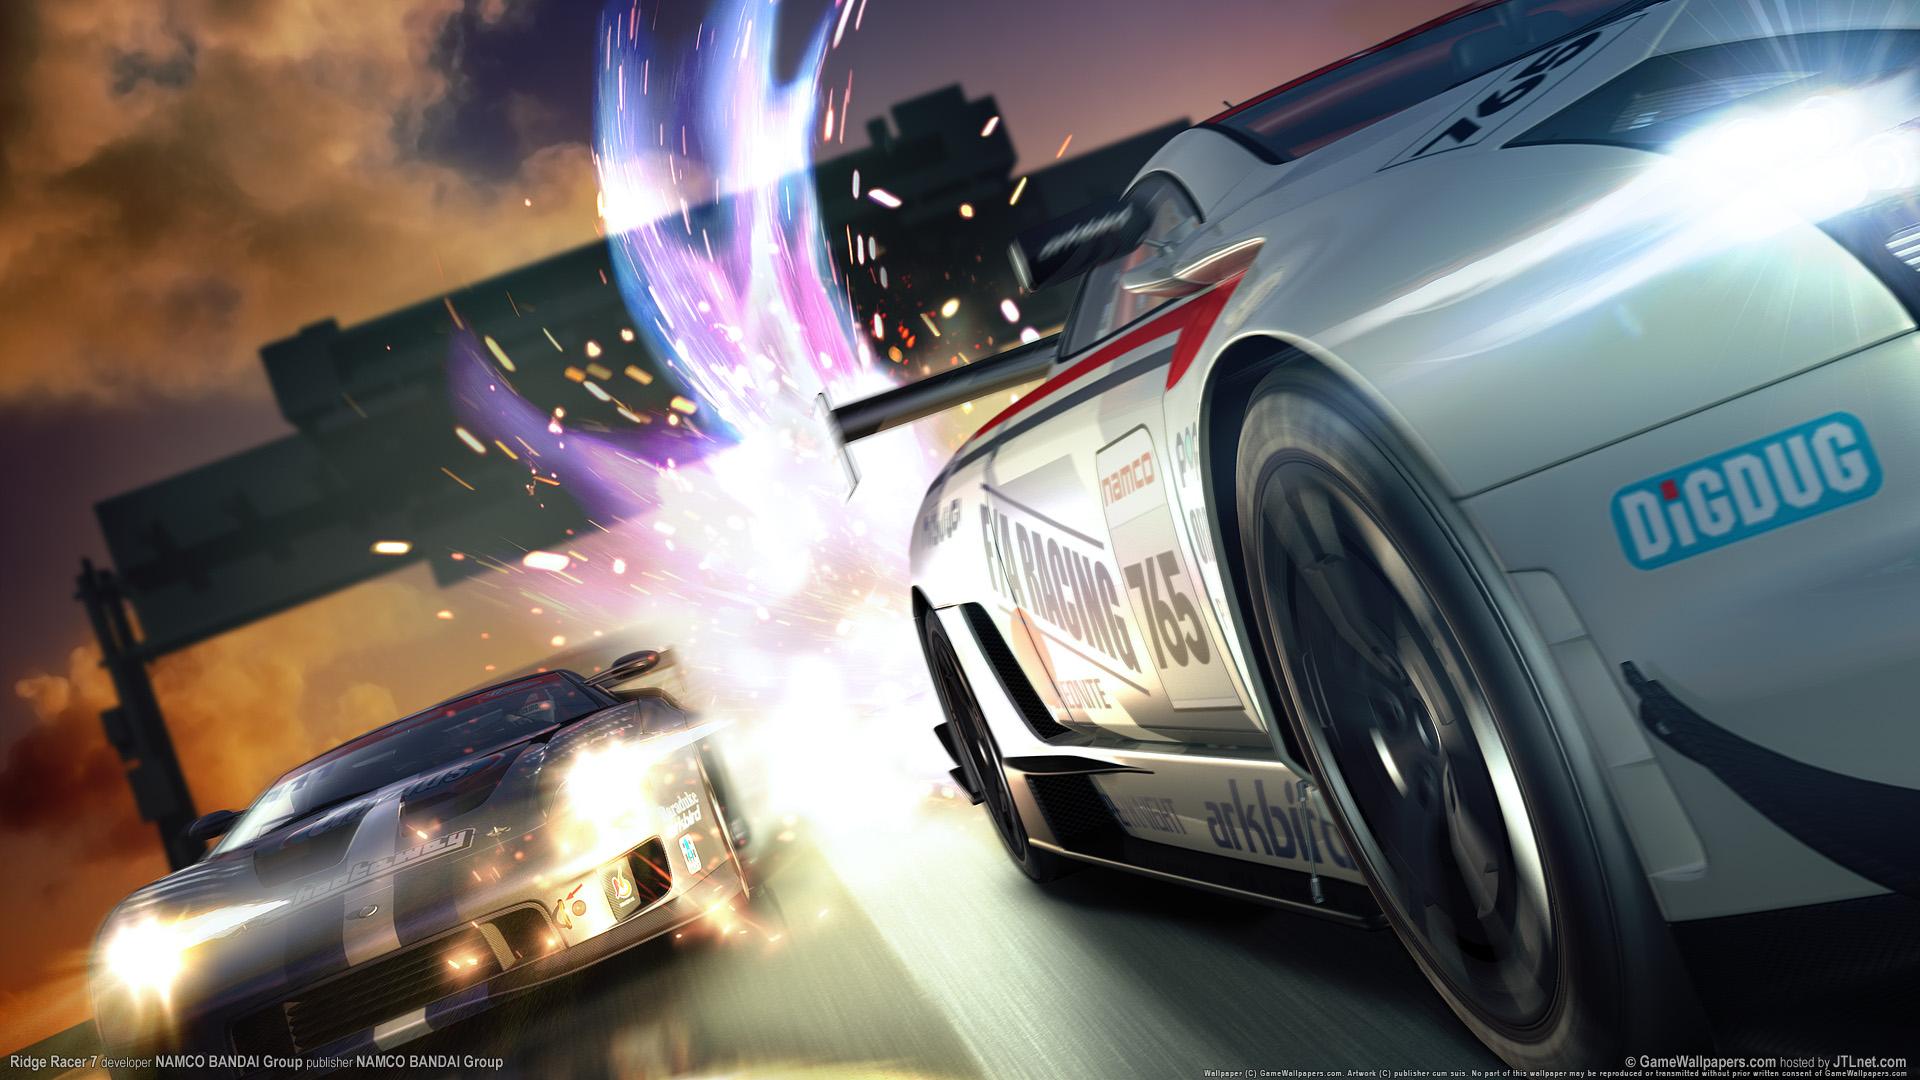 HD Wallpapers Ridge Racer Latest Game